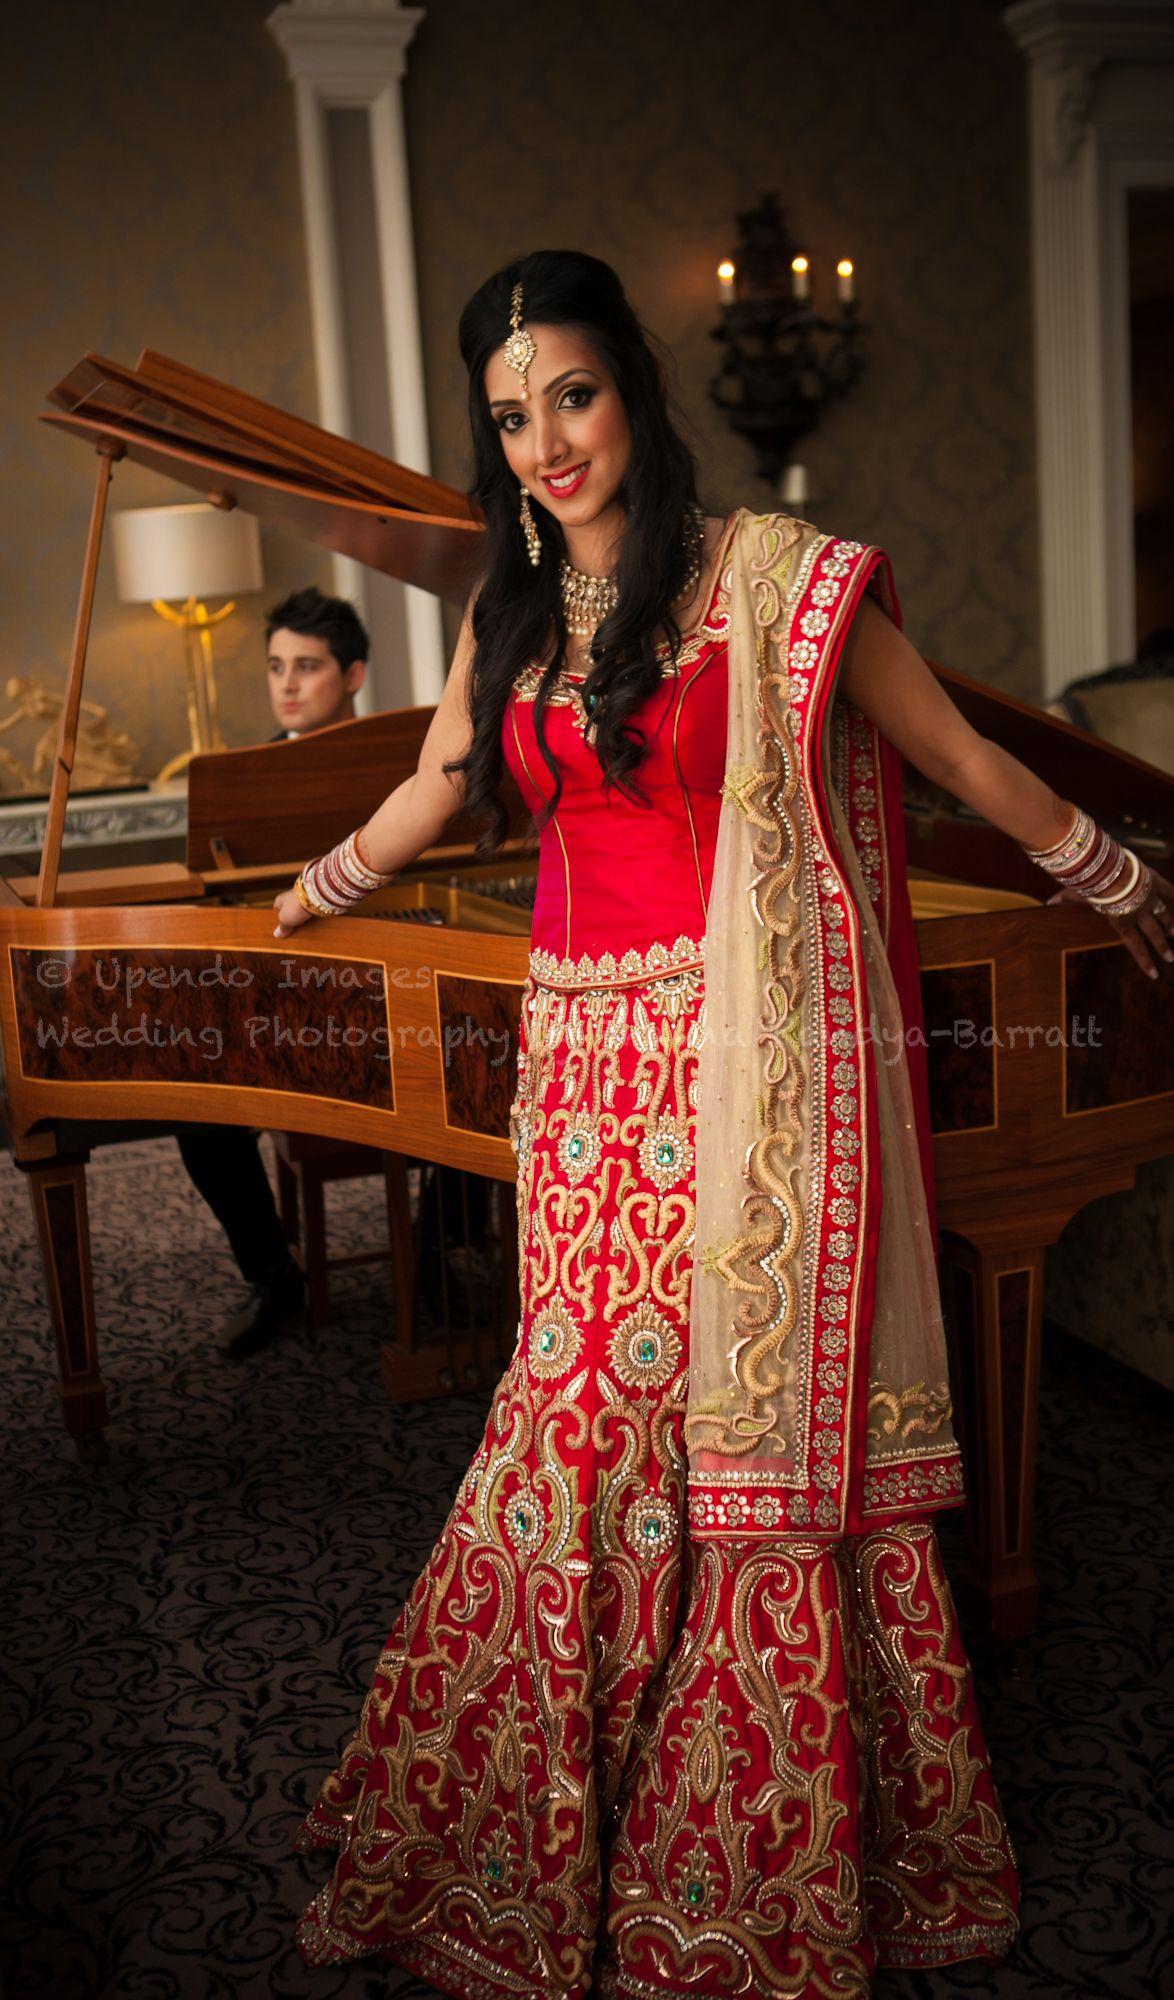 Sahiba in her beautiful Ekta Solanki Dress!